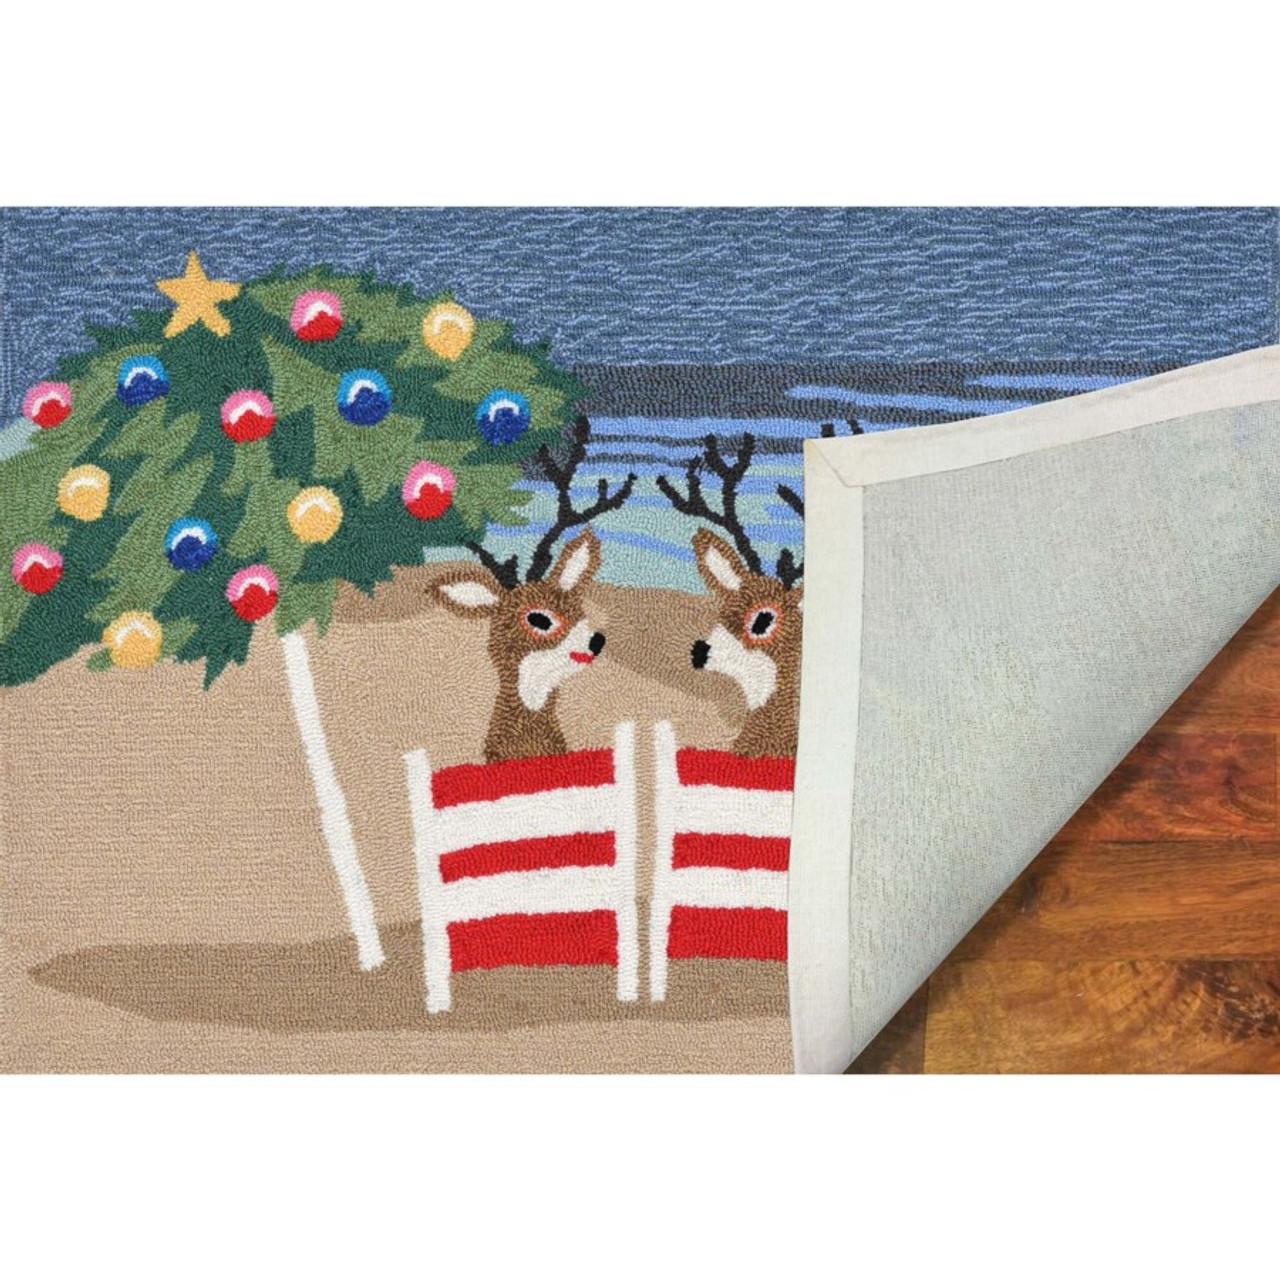 Frontporch Coastal Christmas Indoor/Outdoor Rug - Backing